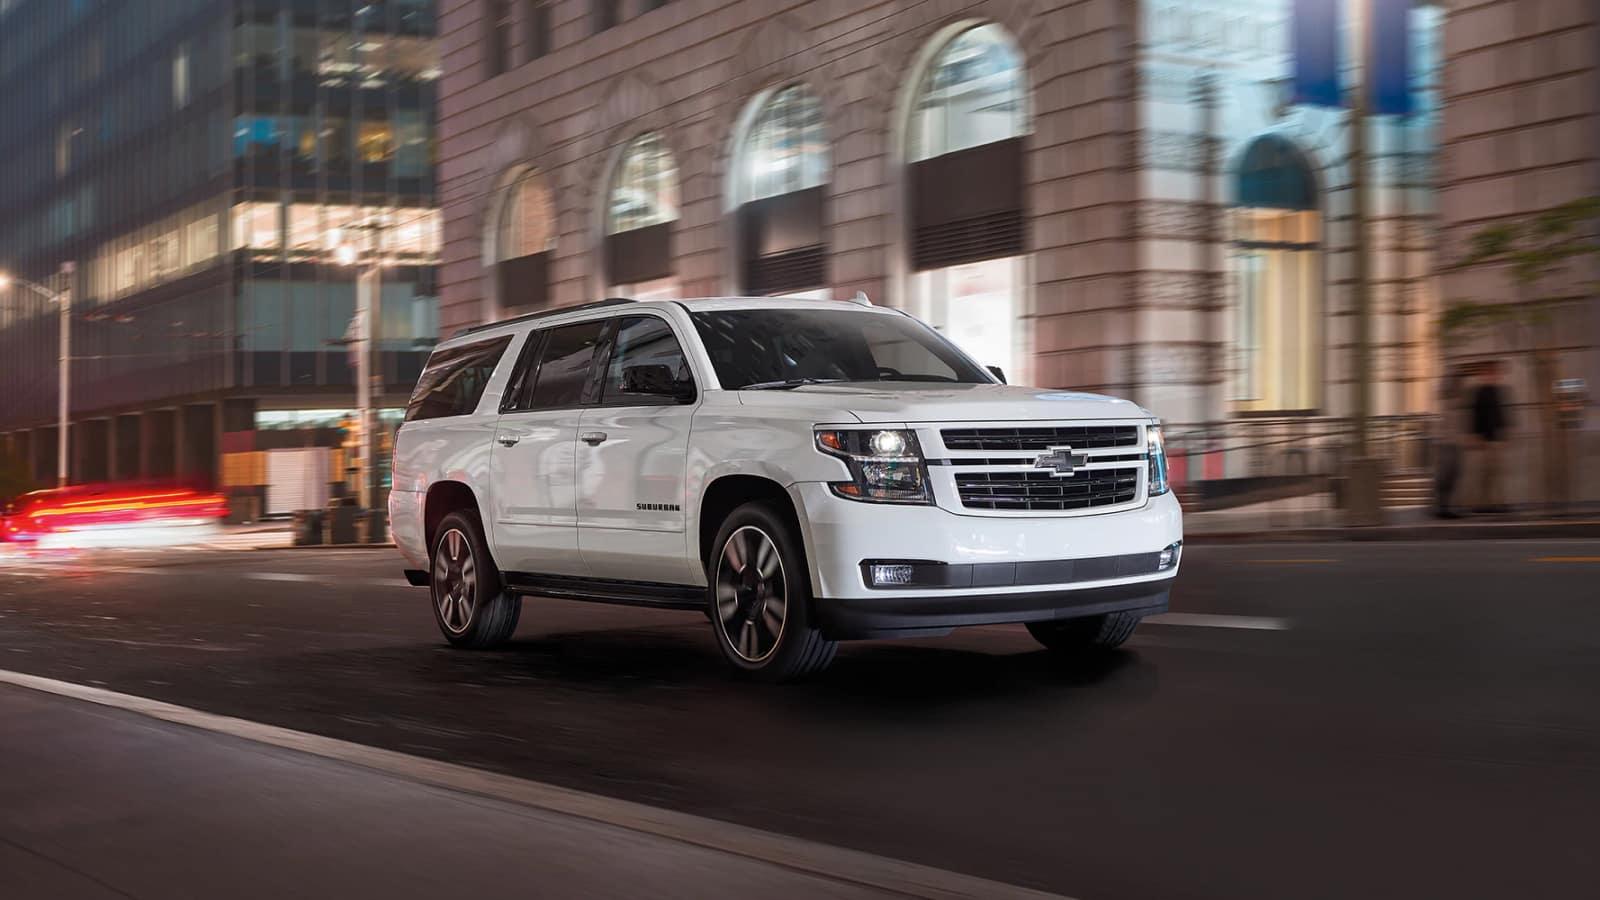 2020 Chevrolet Suburban For Sale In Pensacola, FL